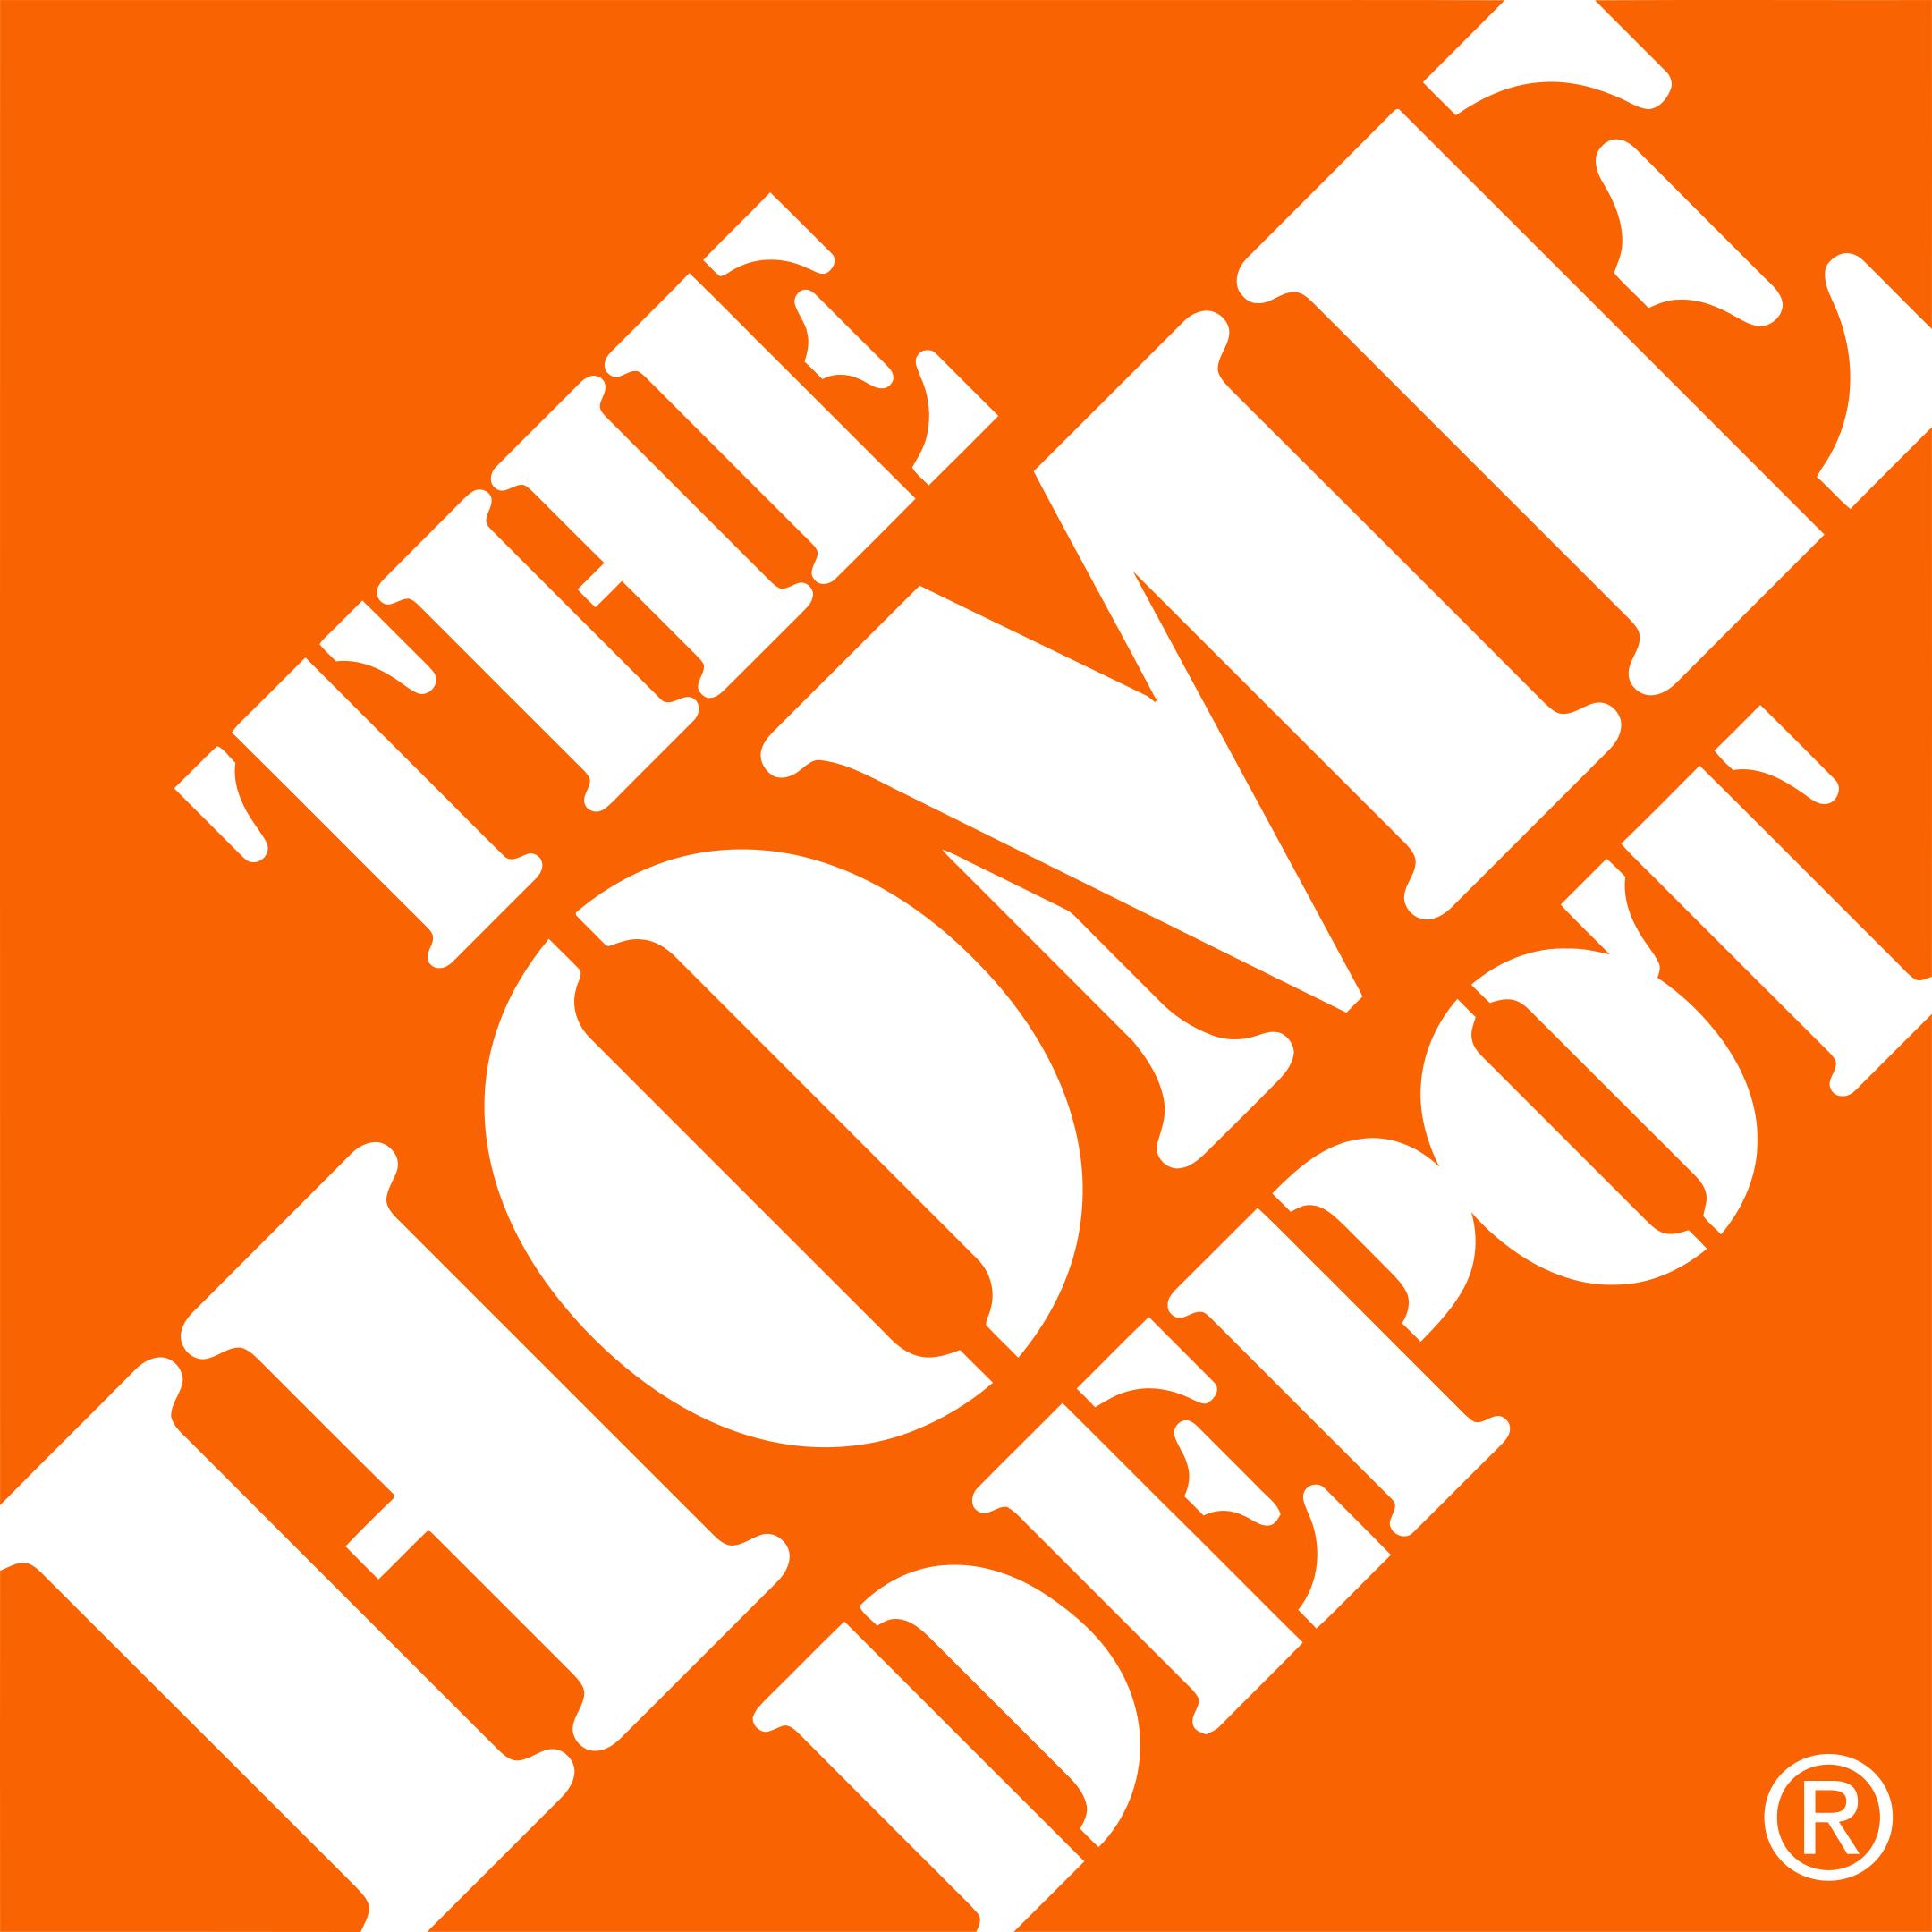 the home depot logo 1 - The Home Depot Logo